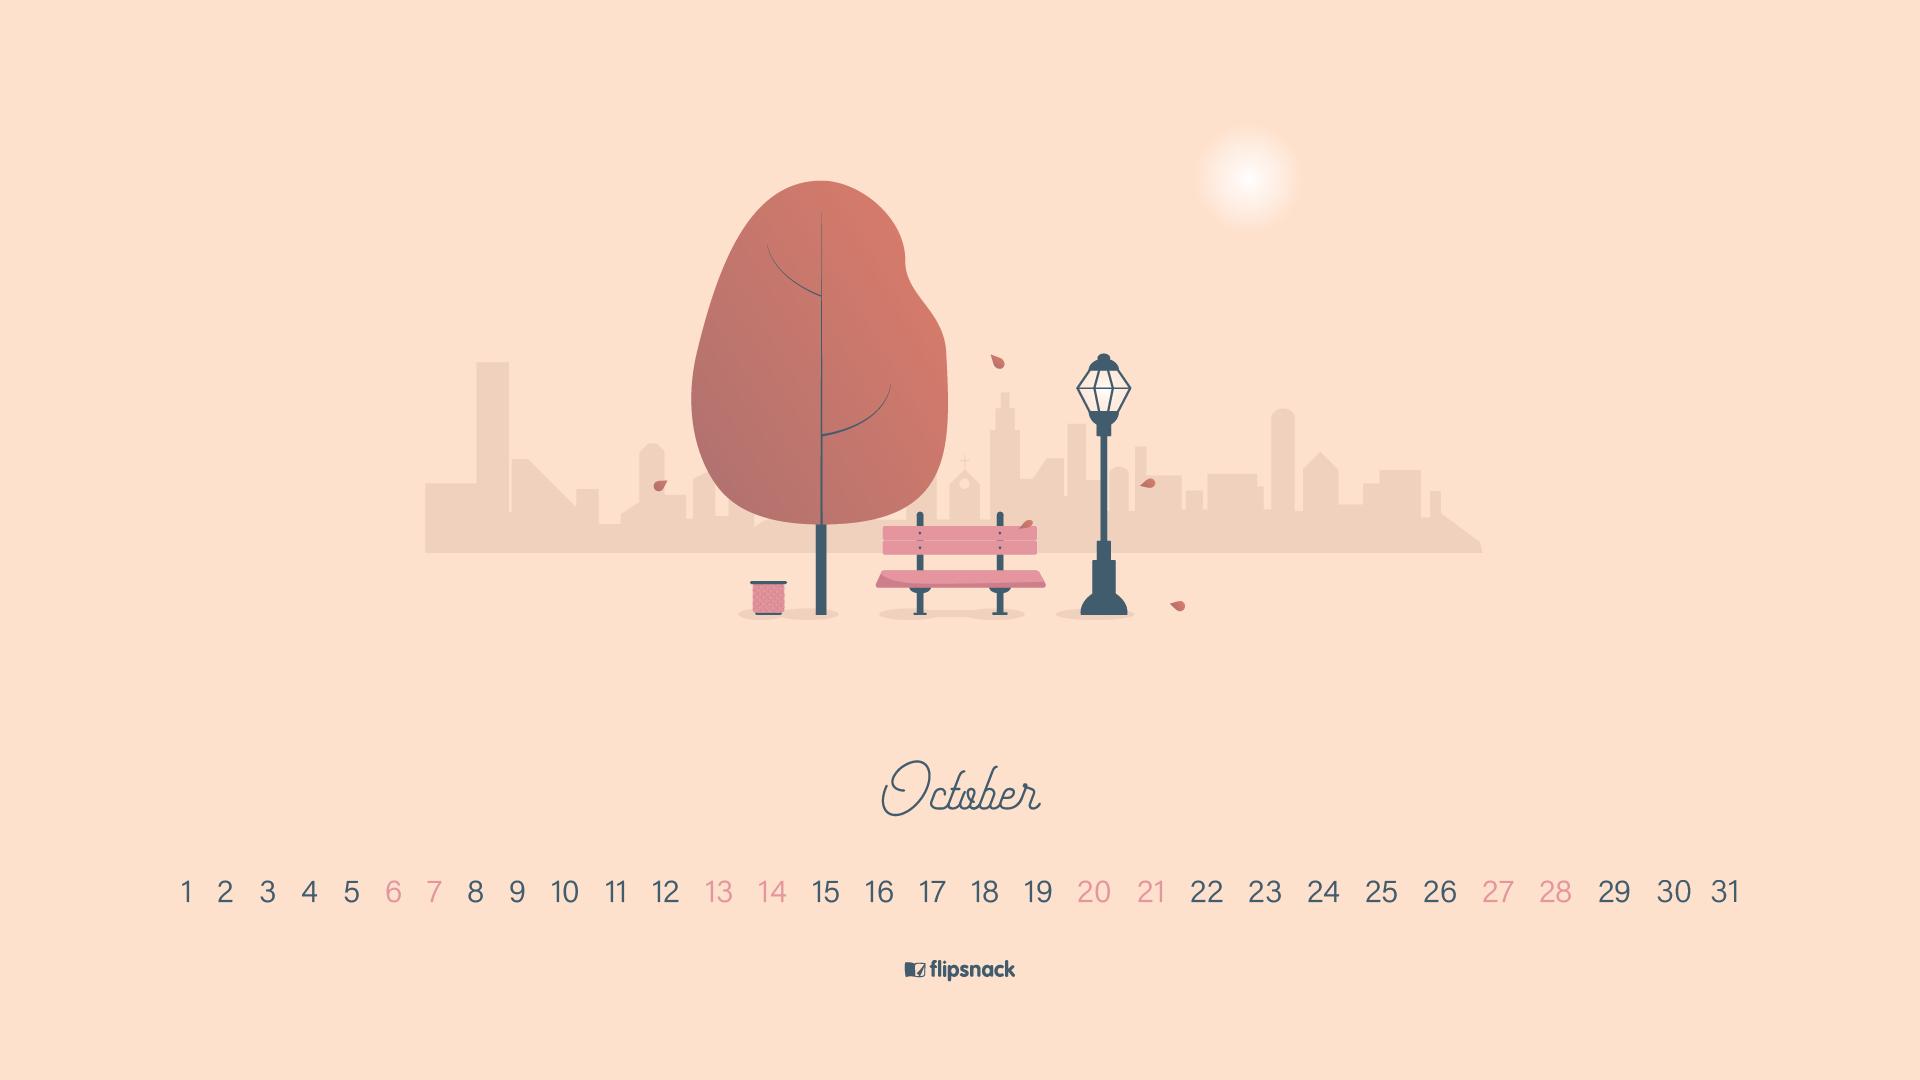 October 2018 wallpaper calendar for